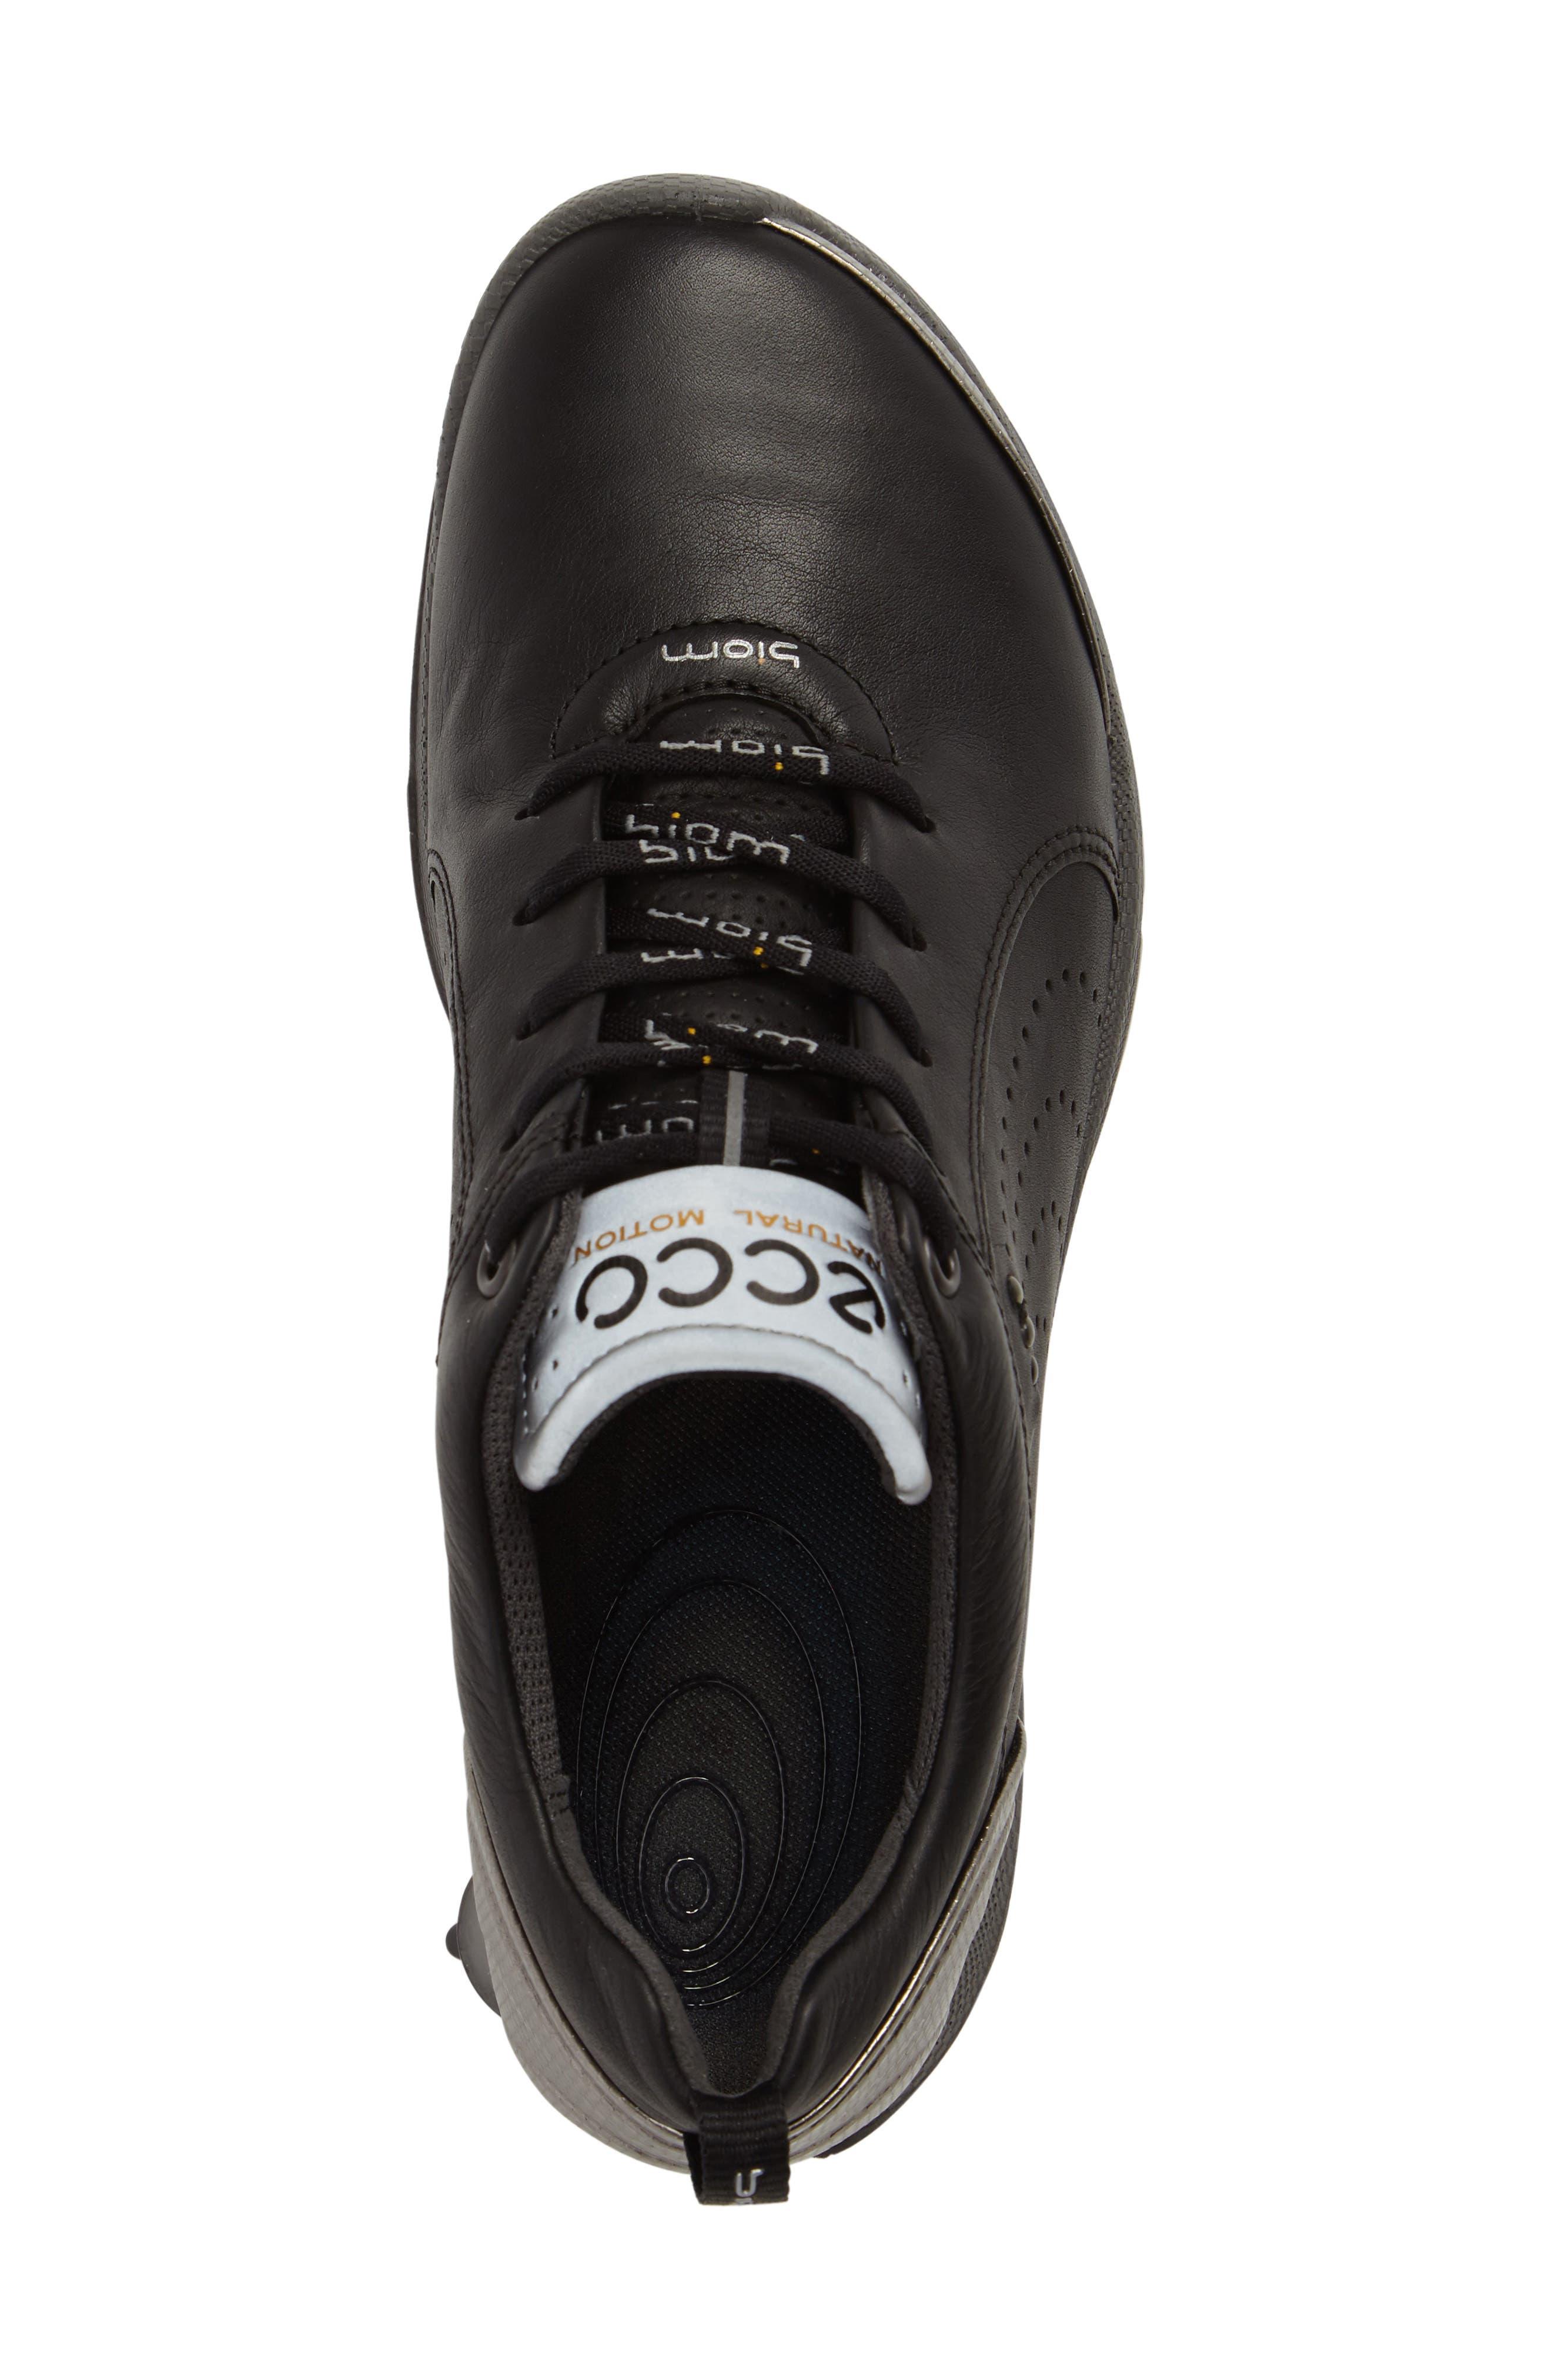 BIOM 2 Waterproof Golf Shoe,                             Alternate thumbnail 5, color,                             BLACK/ BUFFED SILVER LEATHER